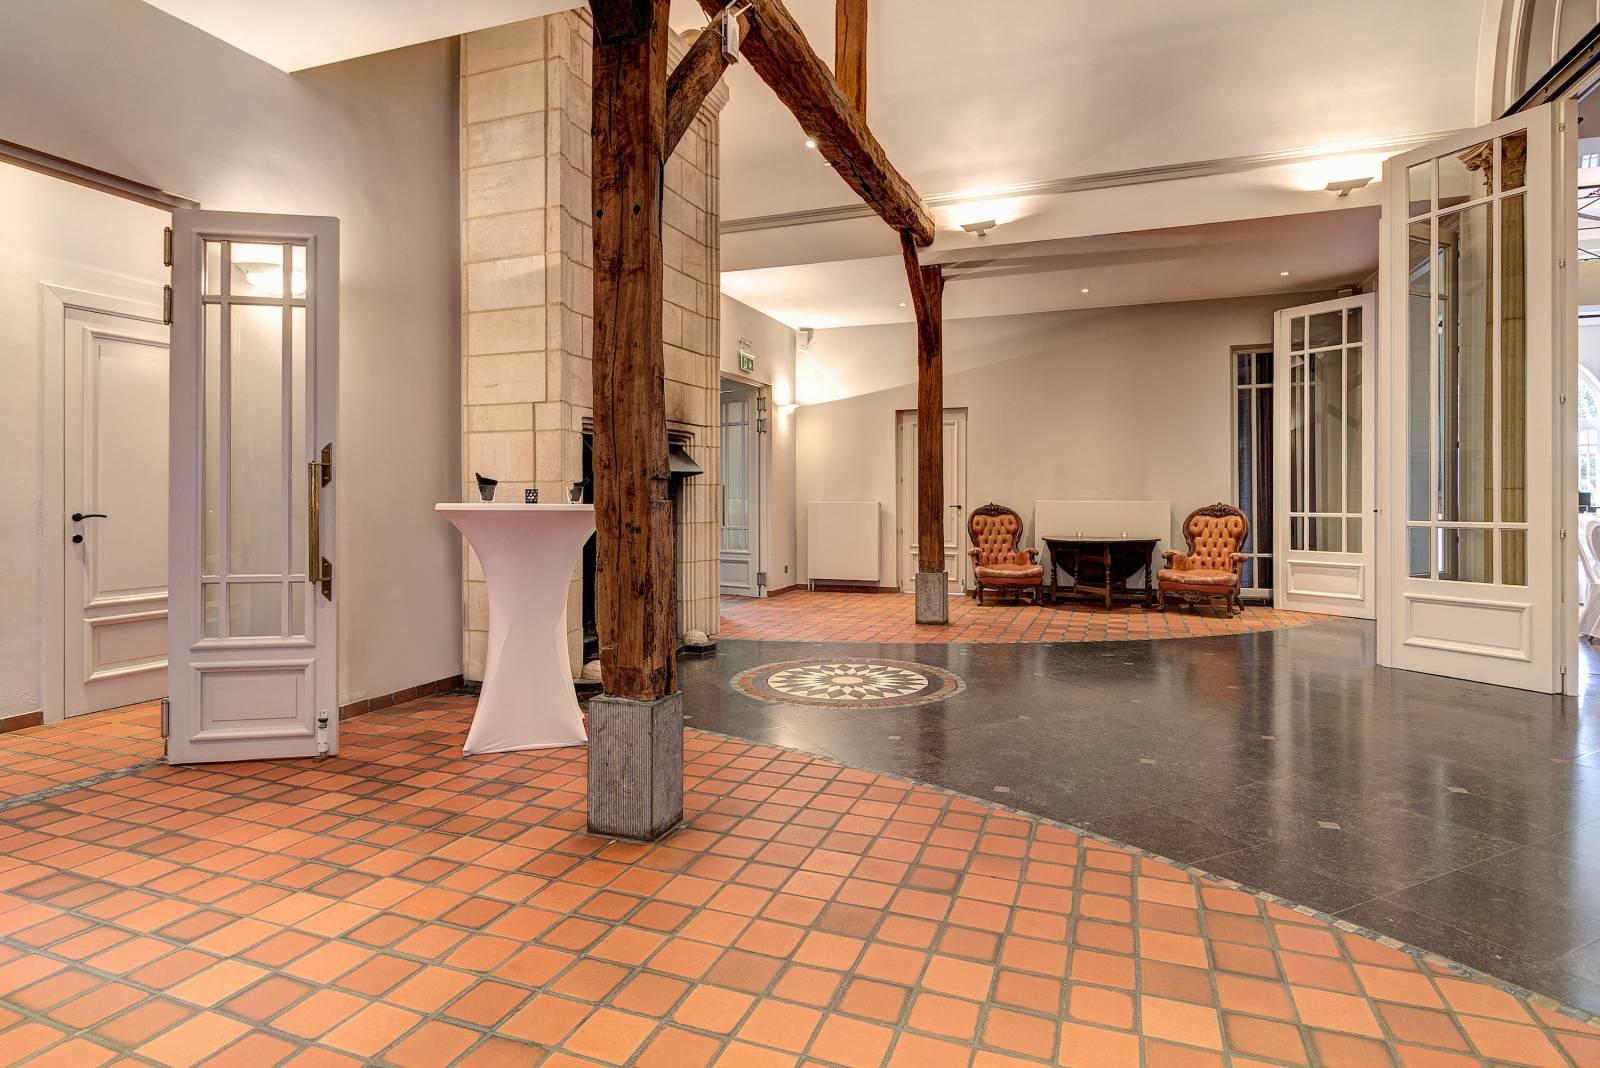 Zaal Orangerie Hof Van Reyen Boechout (1) - House of Weddings